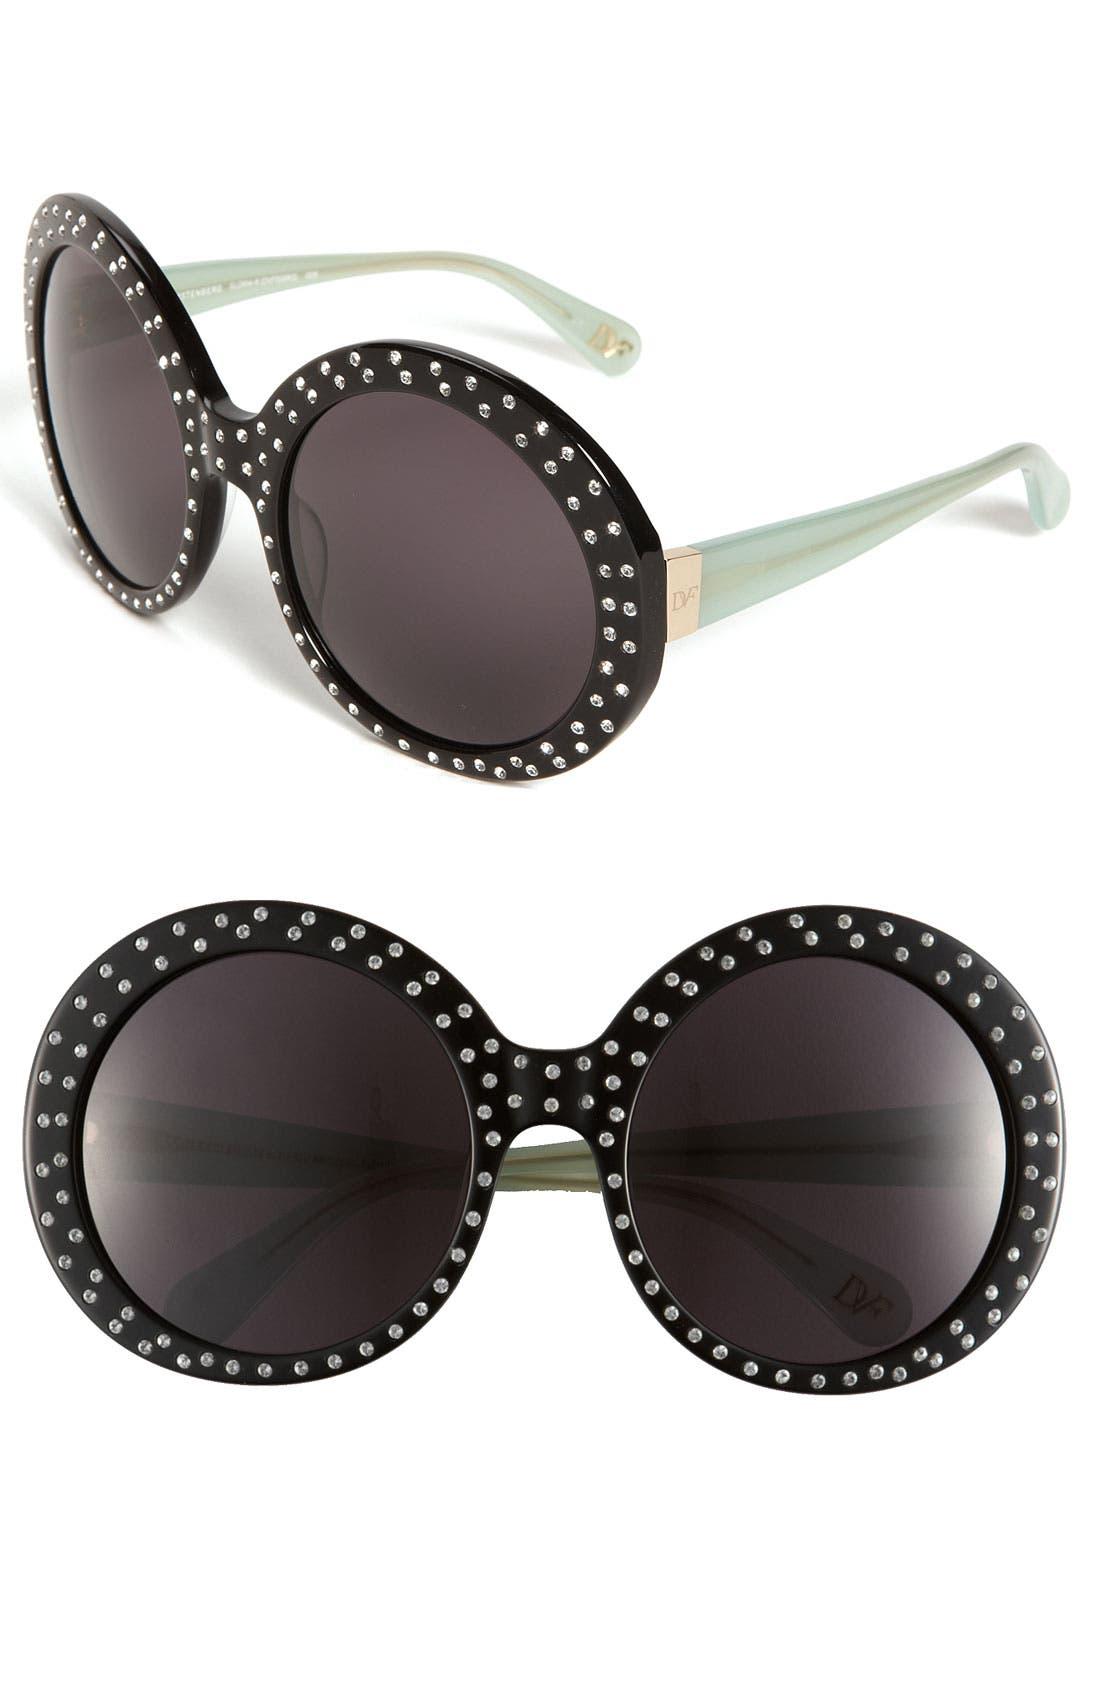 Main Image - Diane von Furstenberg 'Gloria - Oversized' Round Sunglasses